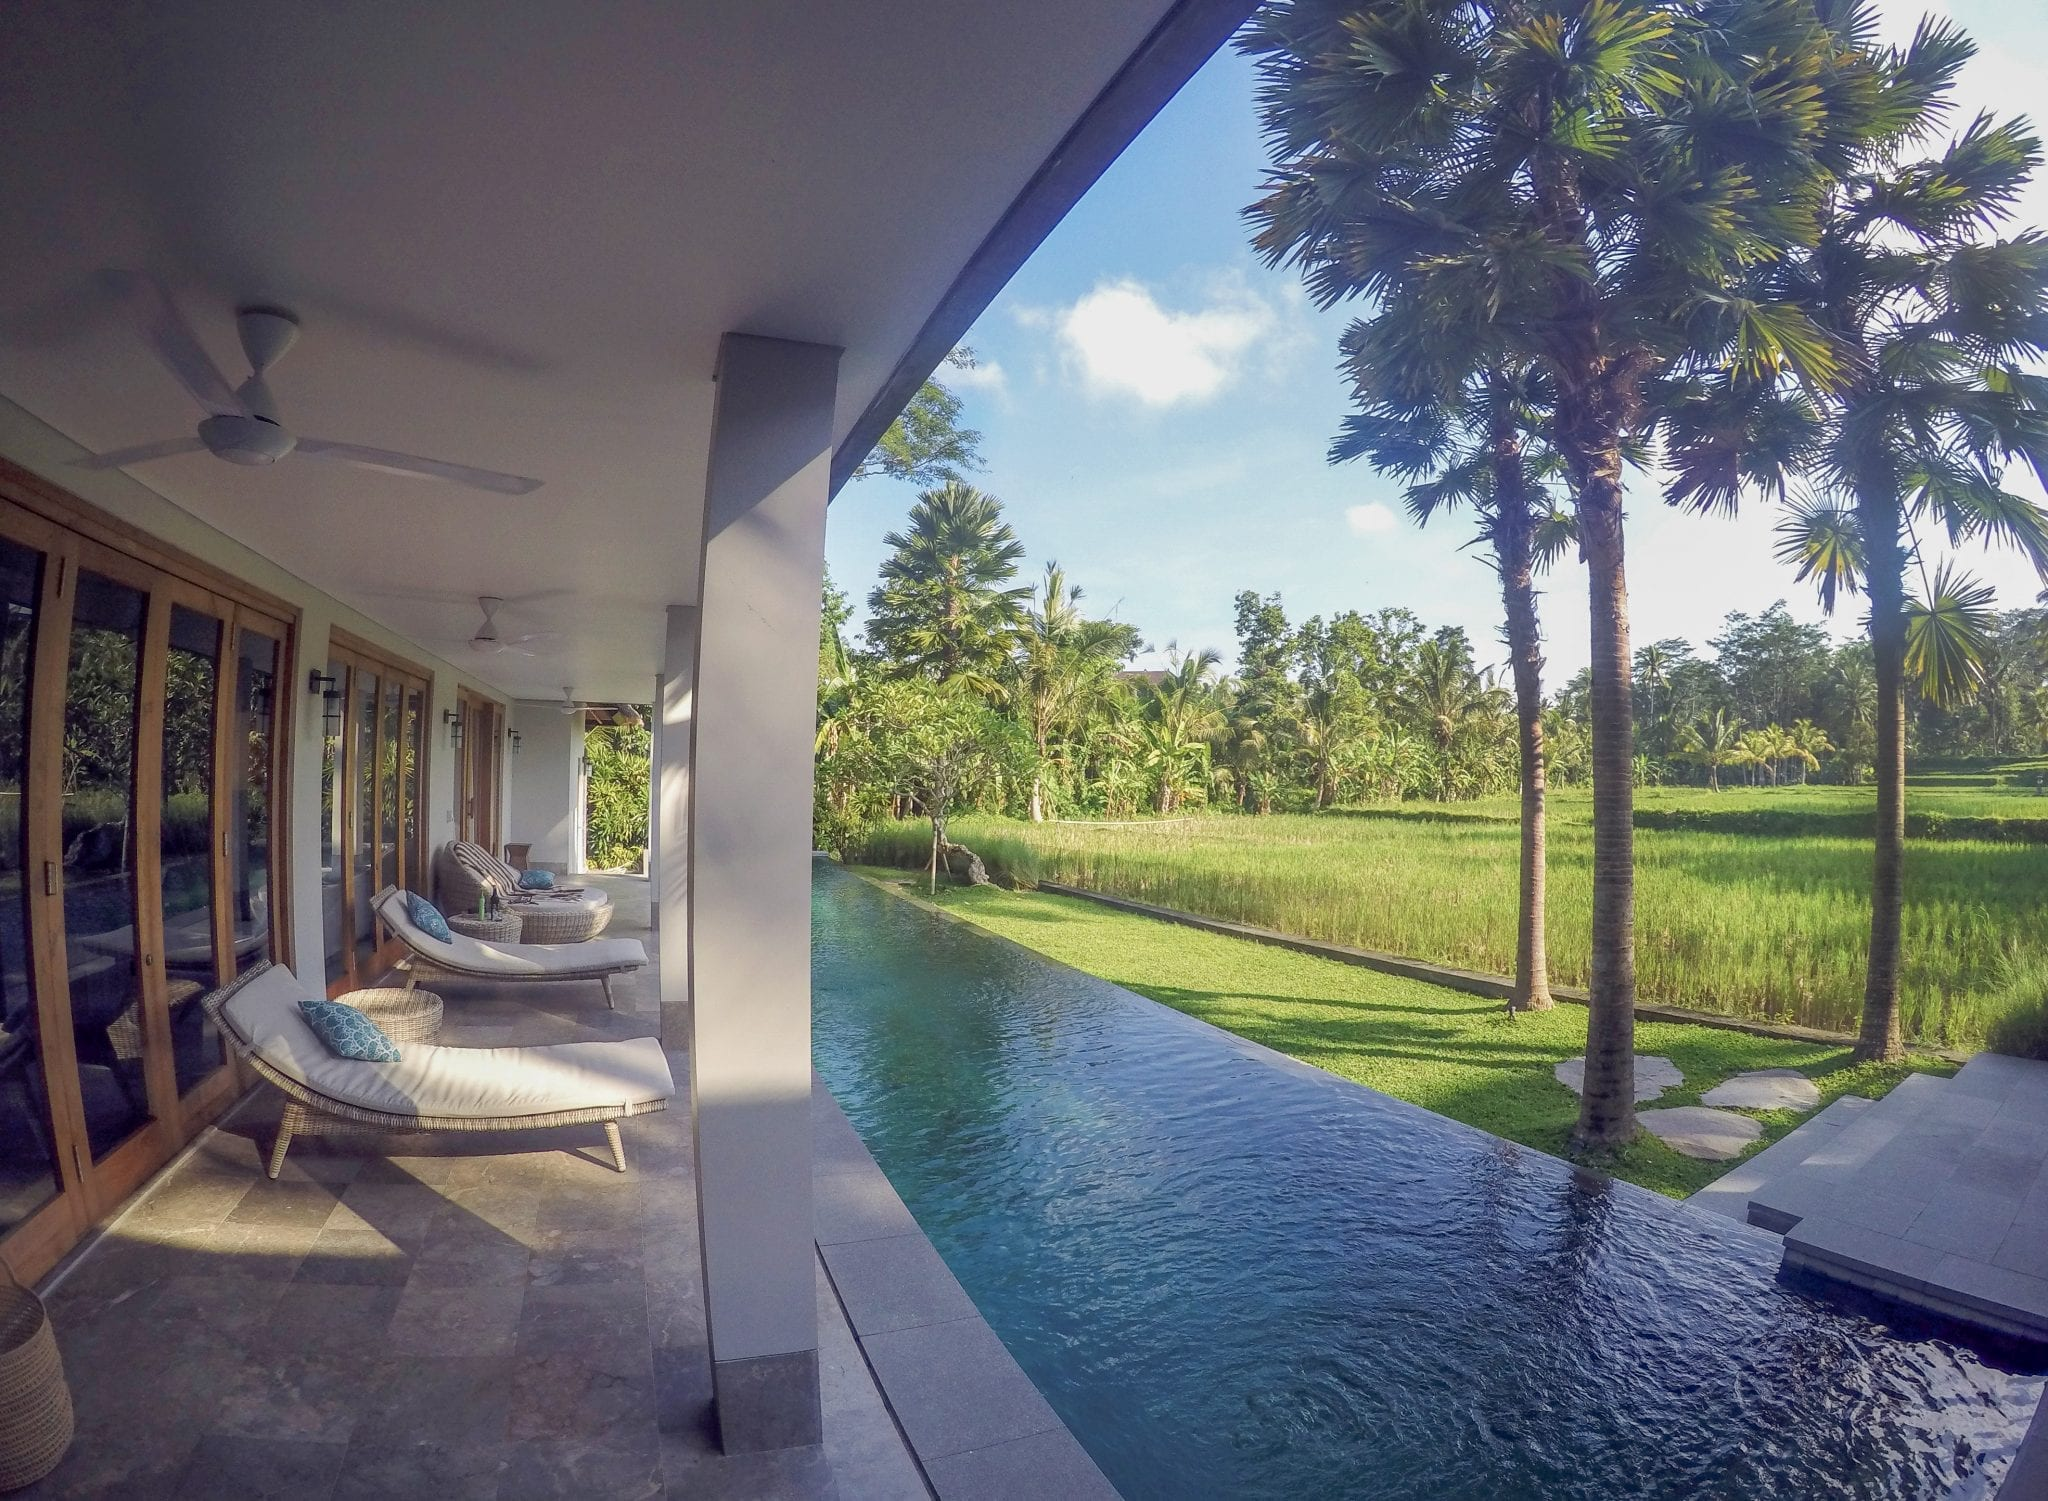 7Ubud Villa Kerasan 16 - REVIEW - Villa Kerasan, Ubud (AirBnB)